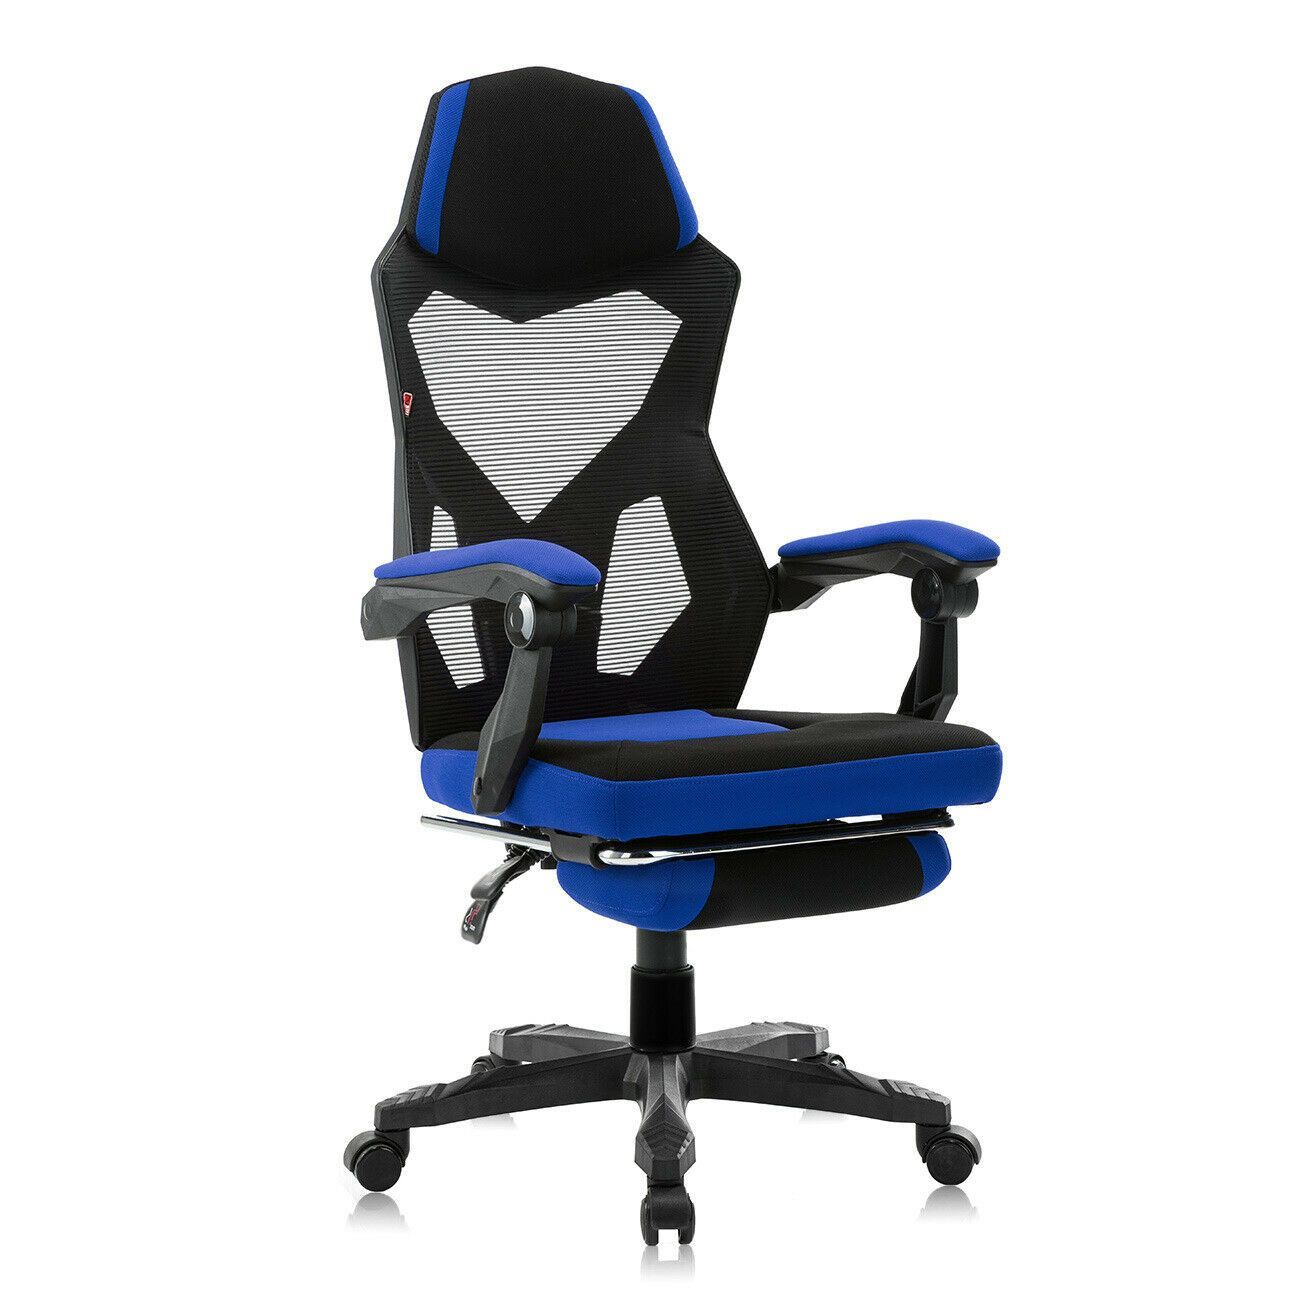 Burostuhl Chefsessel Racing Chair Gaming Stuhl Schreibtischstuhl Blau My Sit Buromobel In 2020 Office Furniture Set Office Furniture Design Ikea Office Furniture